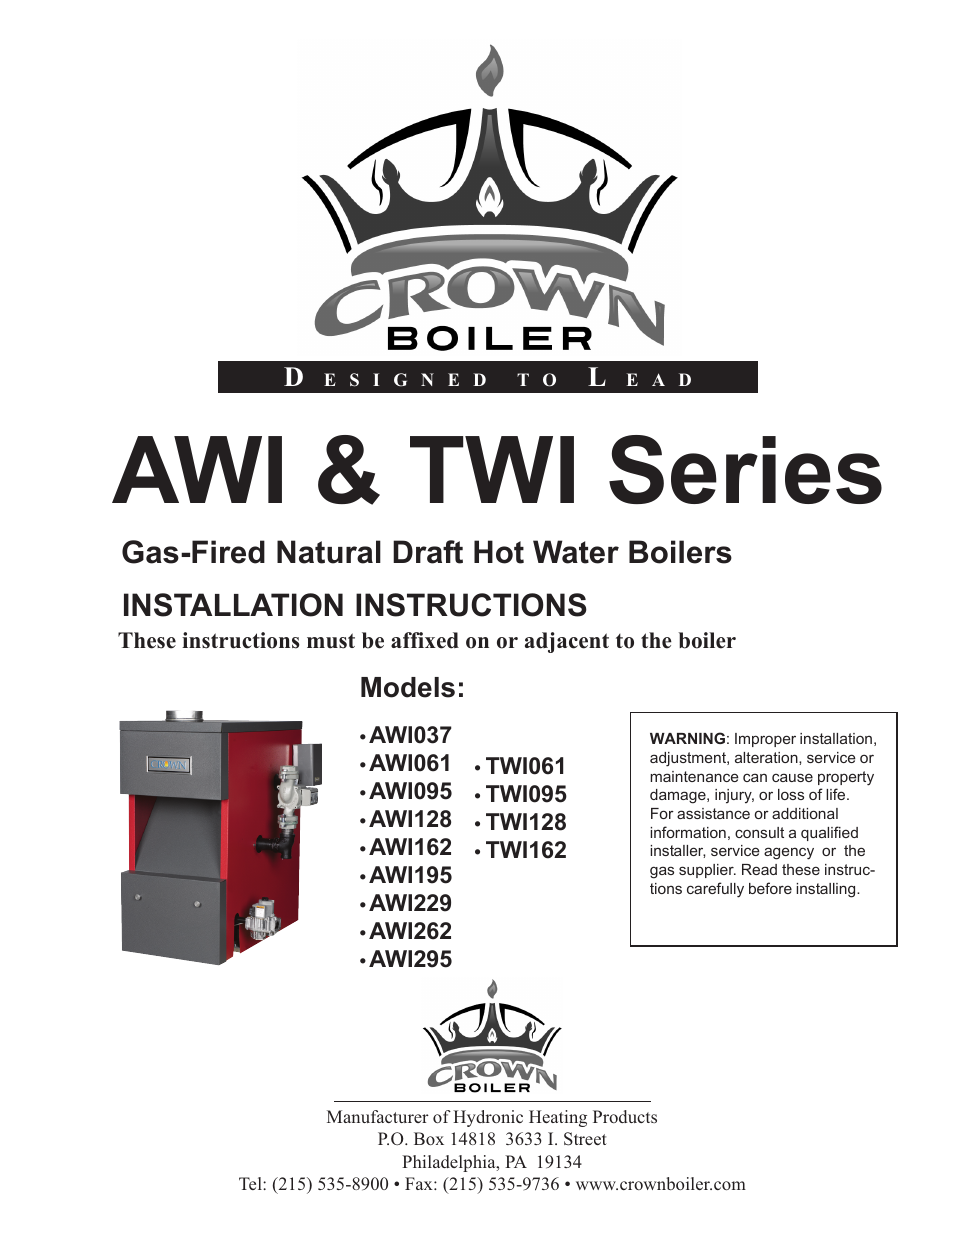 crown boiler awi128 user manual 42 pages also for. Black Bedroom Furniture Sets. Home Design Ideas